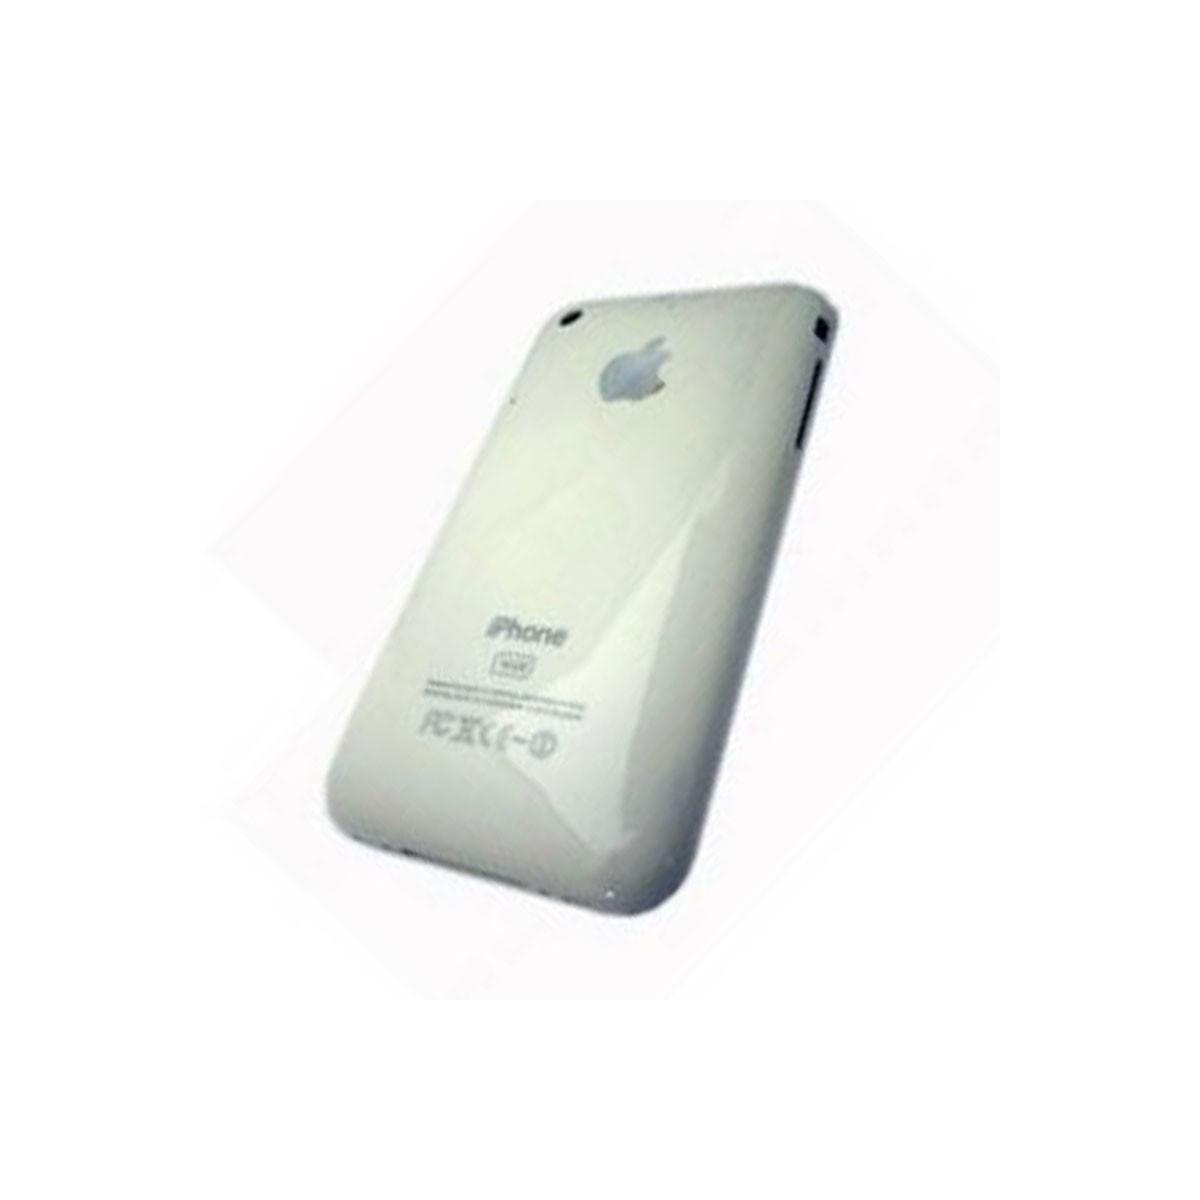 IPHONE 3GS 32GB CARCASA TRASERA, TAPA BATERIA BLANCA